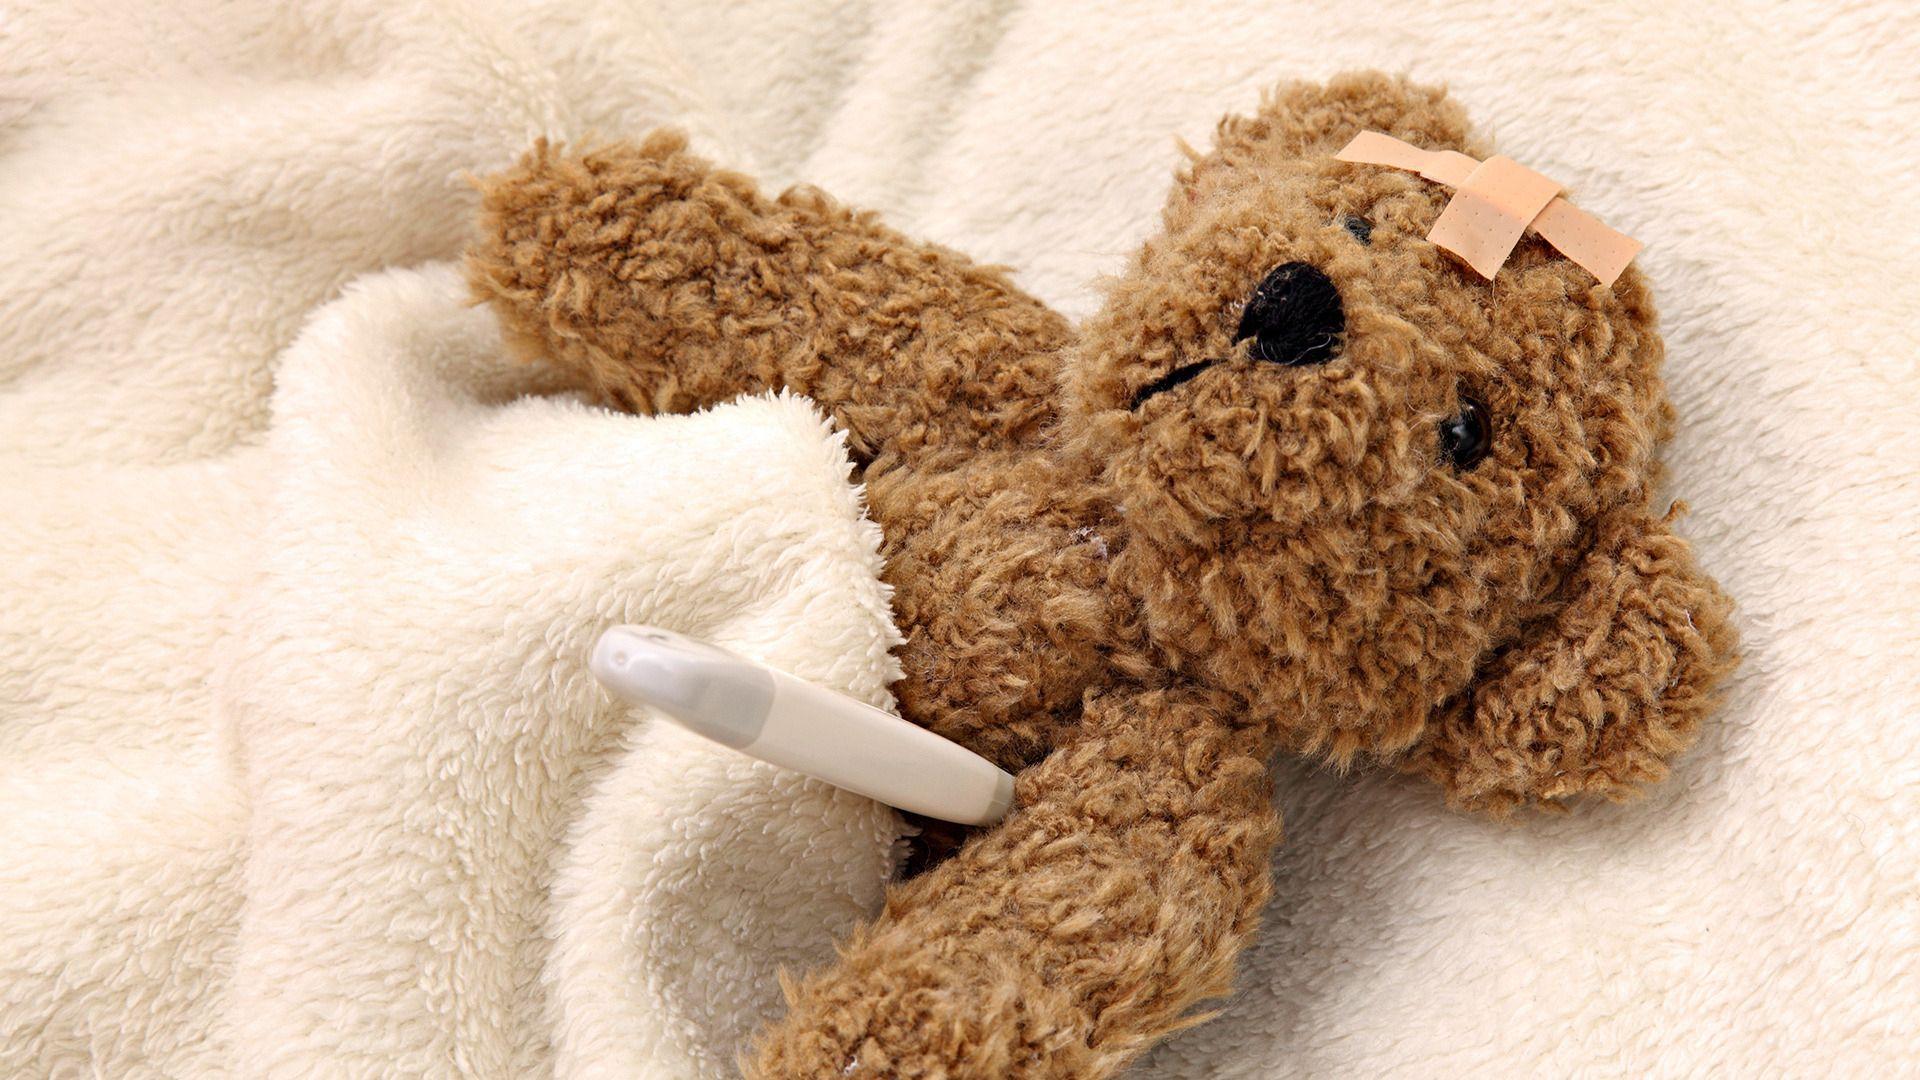 stuffed animals teddy bears fresh new hd wallpaper your popular hd wallpaper shared via slingpic